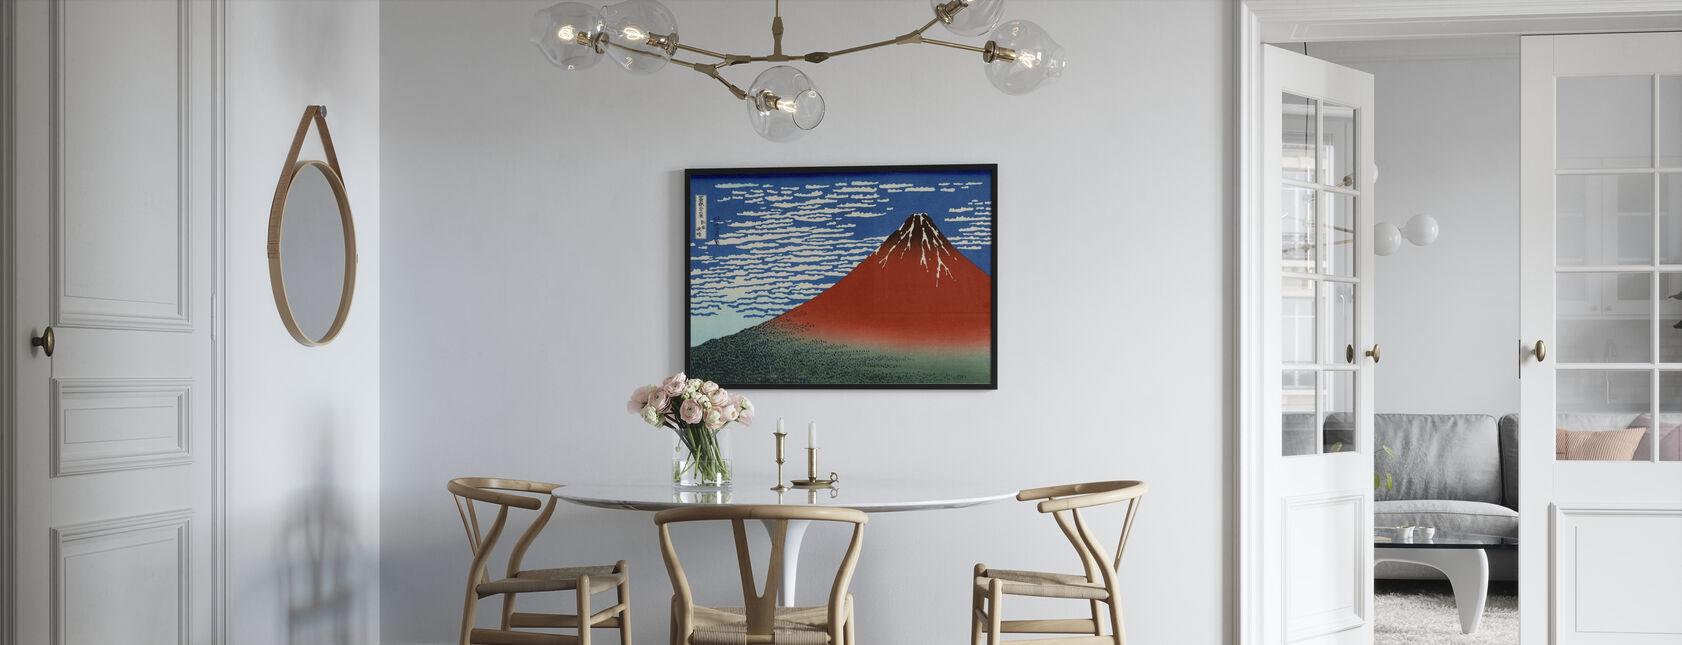 Red Fuji, Katsushika Hokusai - Poster - Kitchen